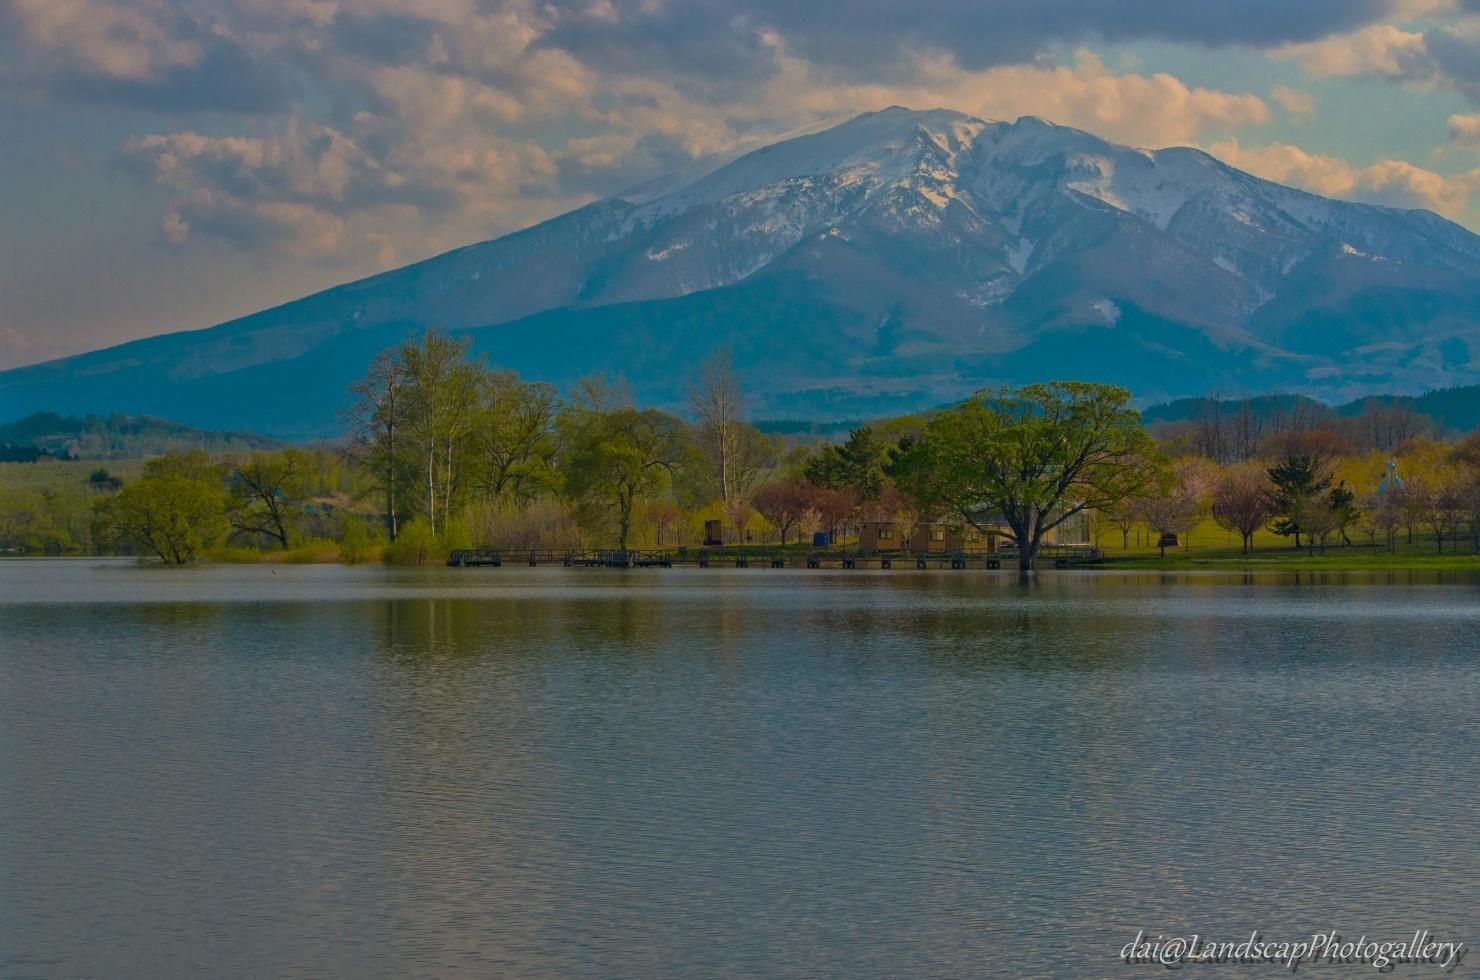 春の津軽富士見湖と津軽富士風景